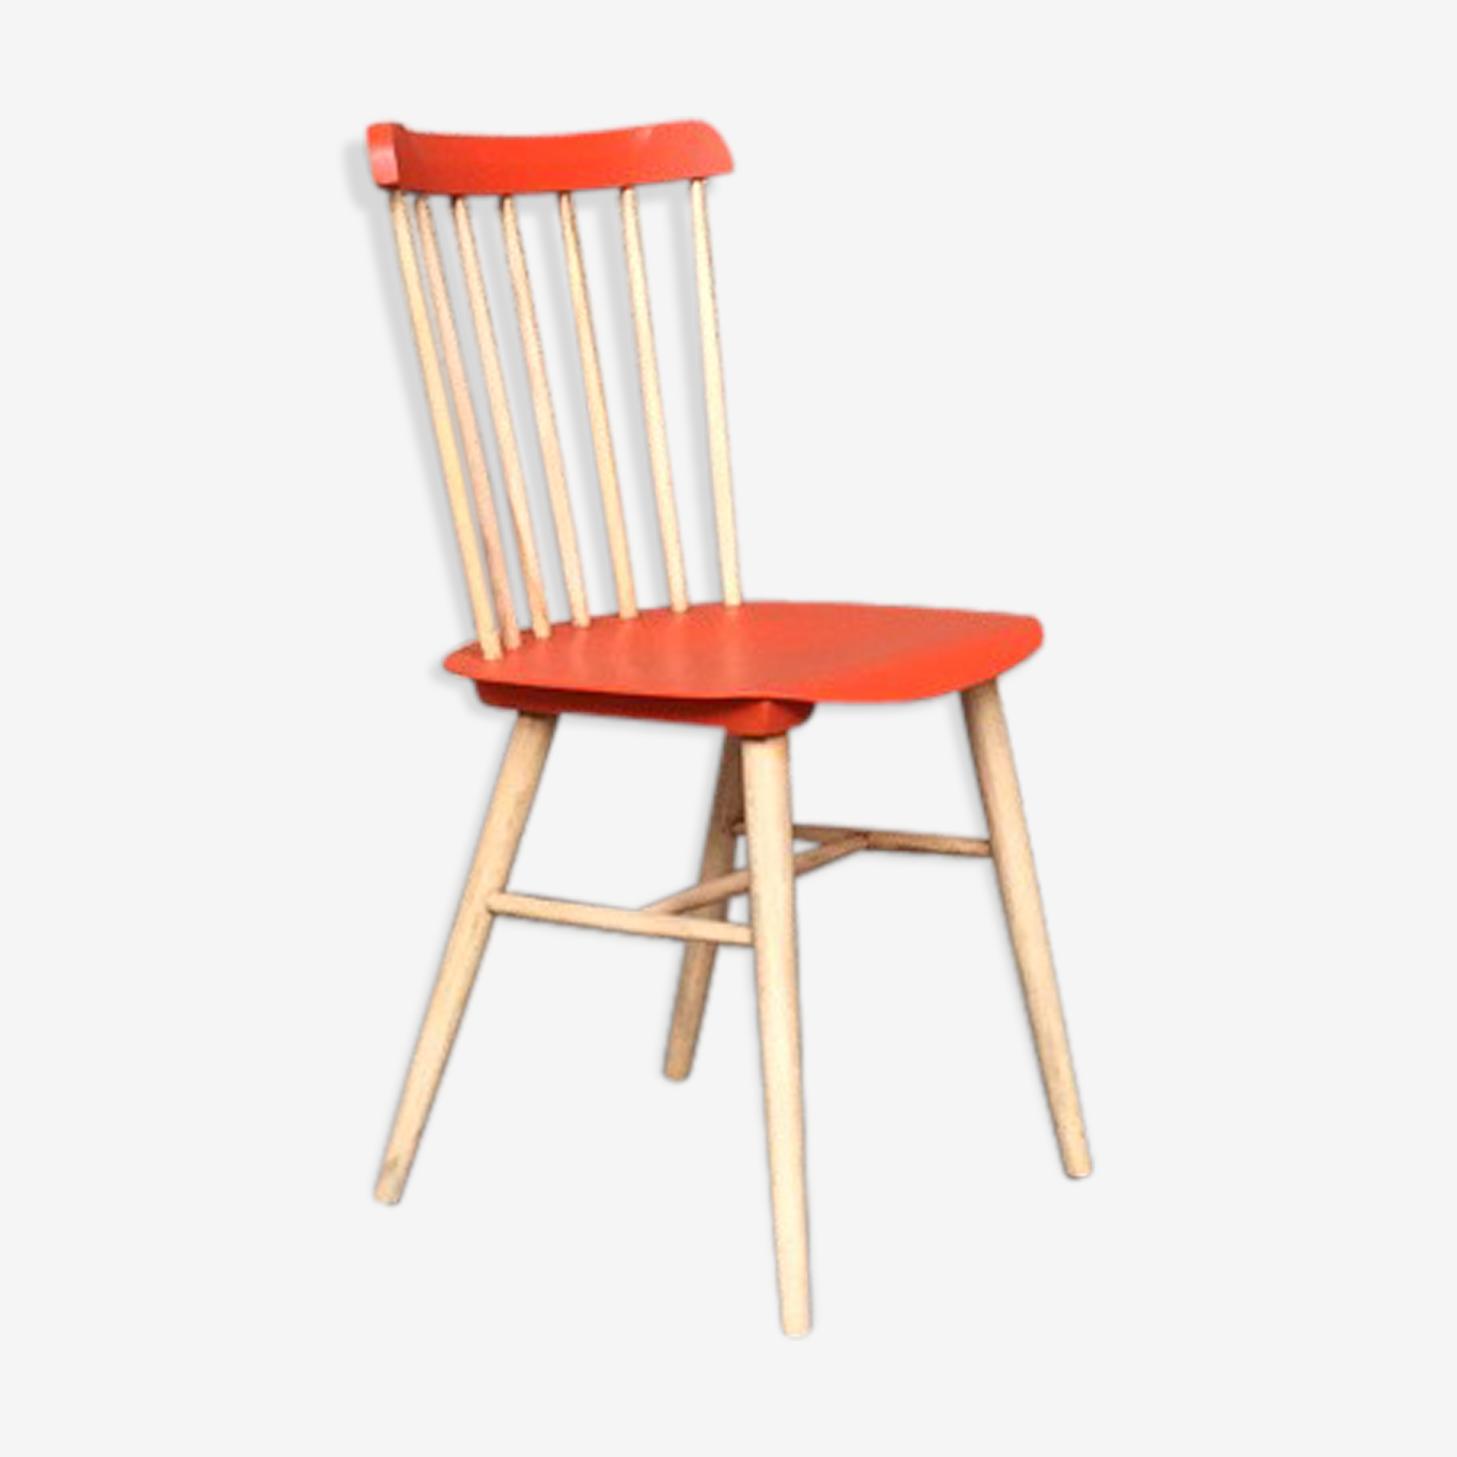 Vintage Baumann style bar chair in solid beech wood